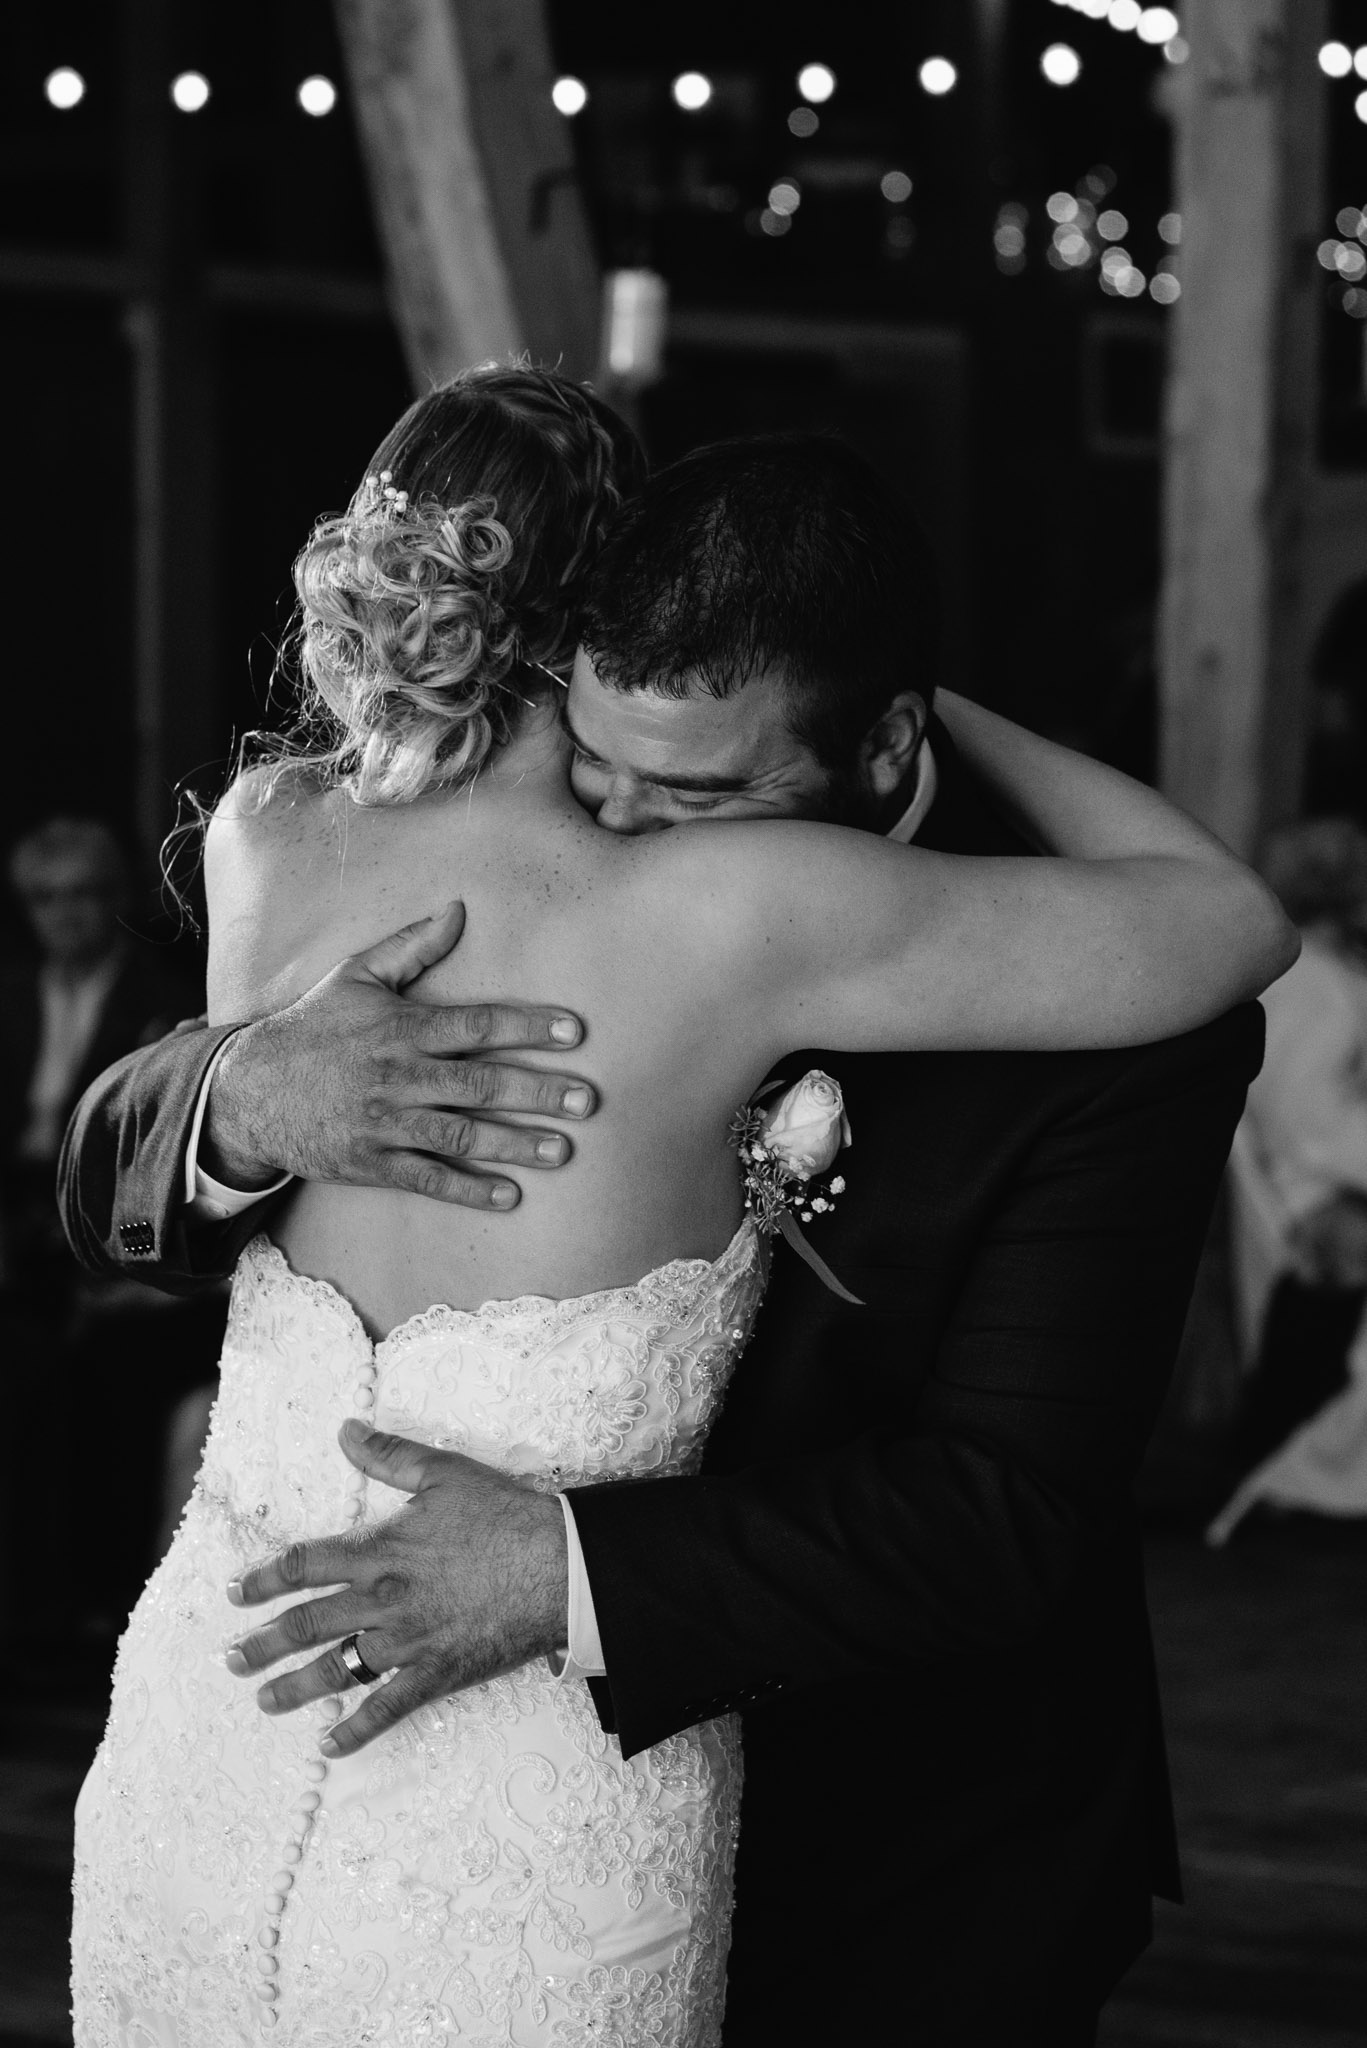 pittsburgh-ligonier-wedding-photographer-the-event-barn-at-highland-farms-41.jpg